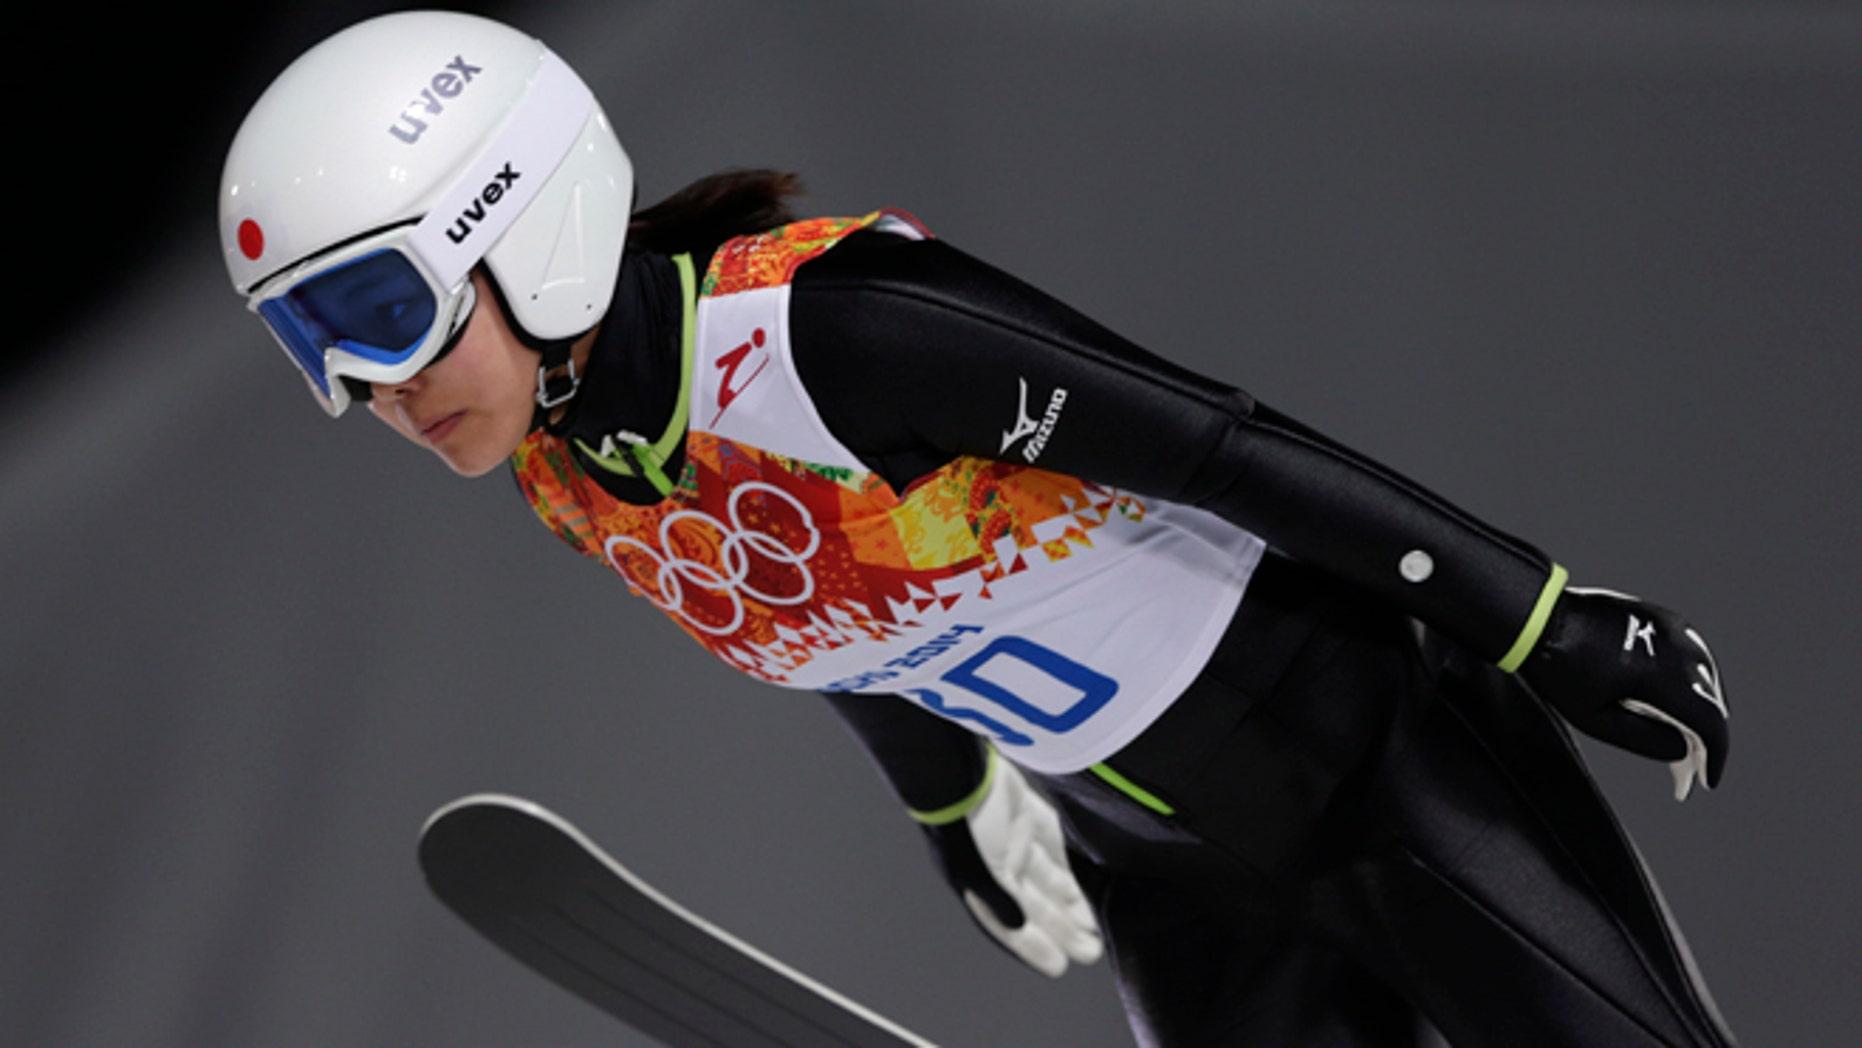 Feb. 11, 2014: Japan's Sara Takanashi makes her trial jump in the women's ski jumping normal hill final at the 2014 Winter Olympics in Krasnaya Polyana, Russia.